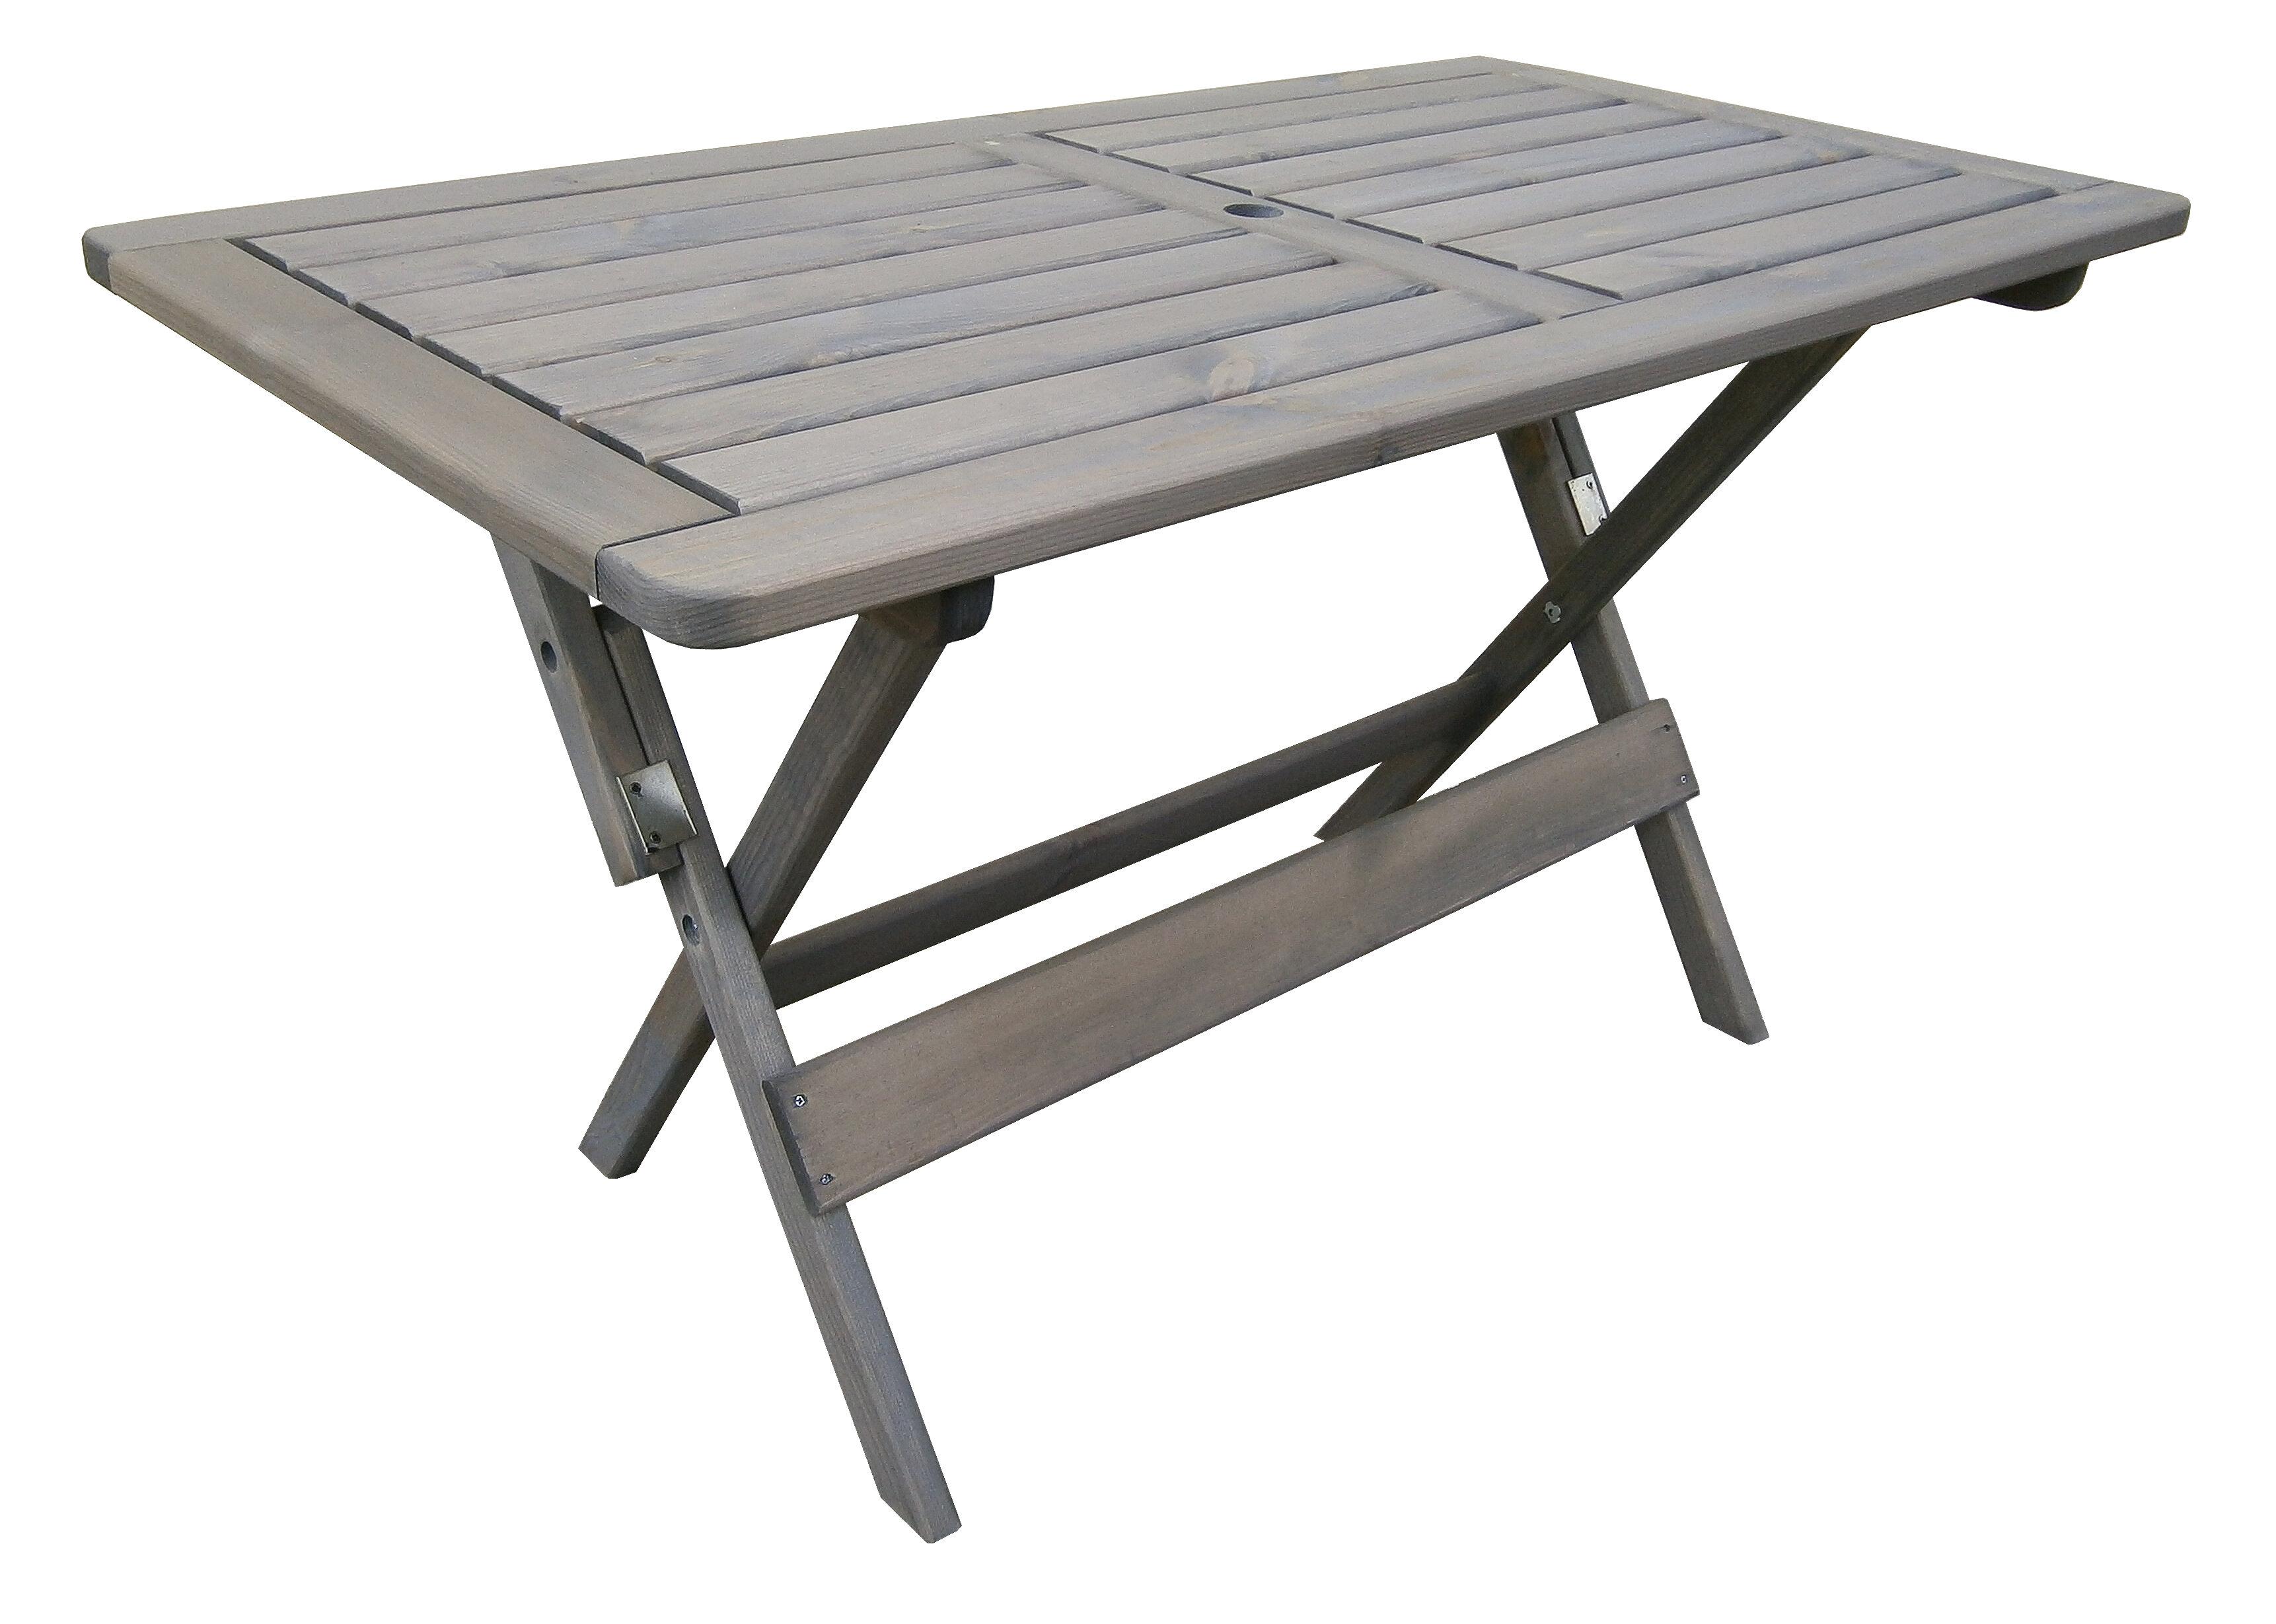 Arinda Folding Wooden Dining Table